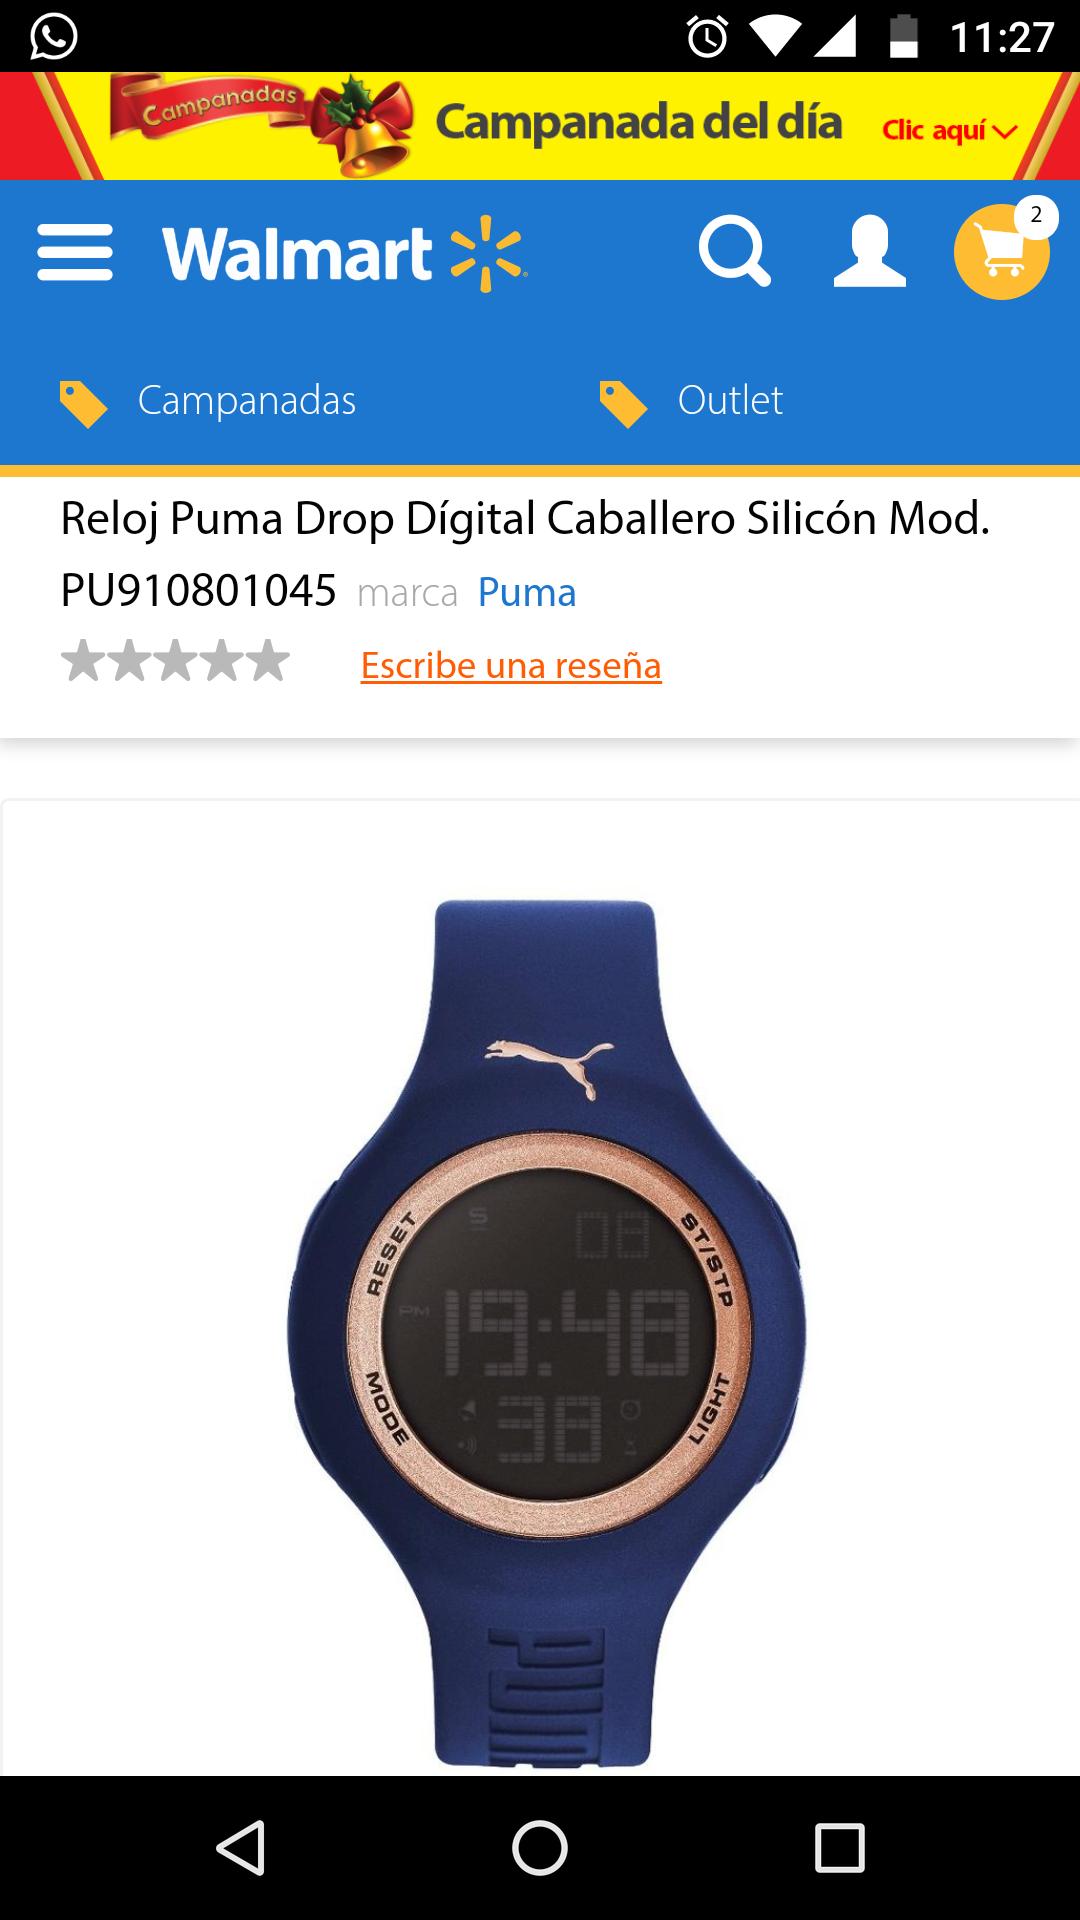 Walmart: Reloj puma Drop digital para caballero